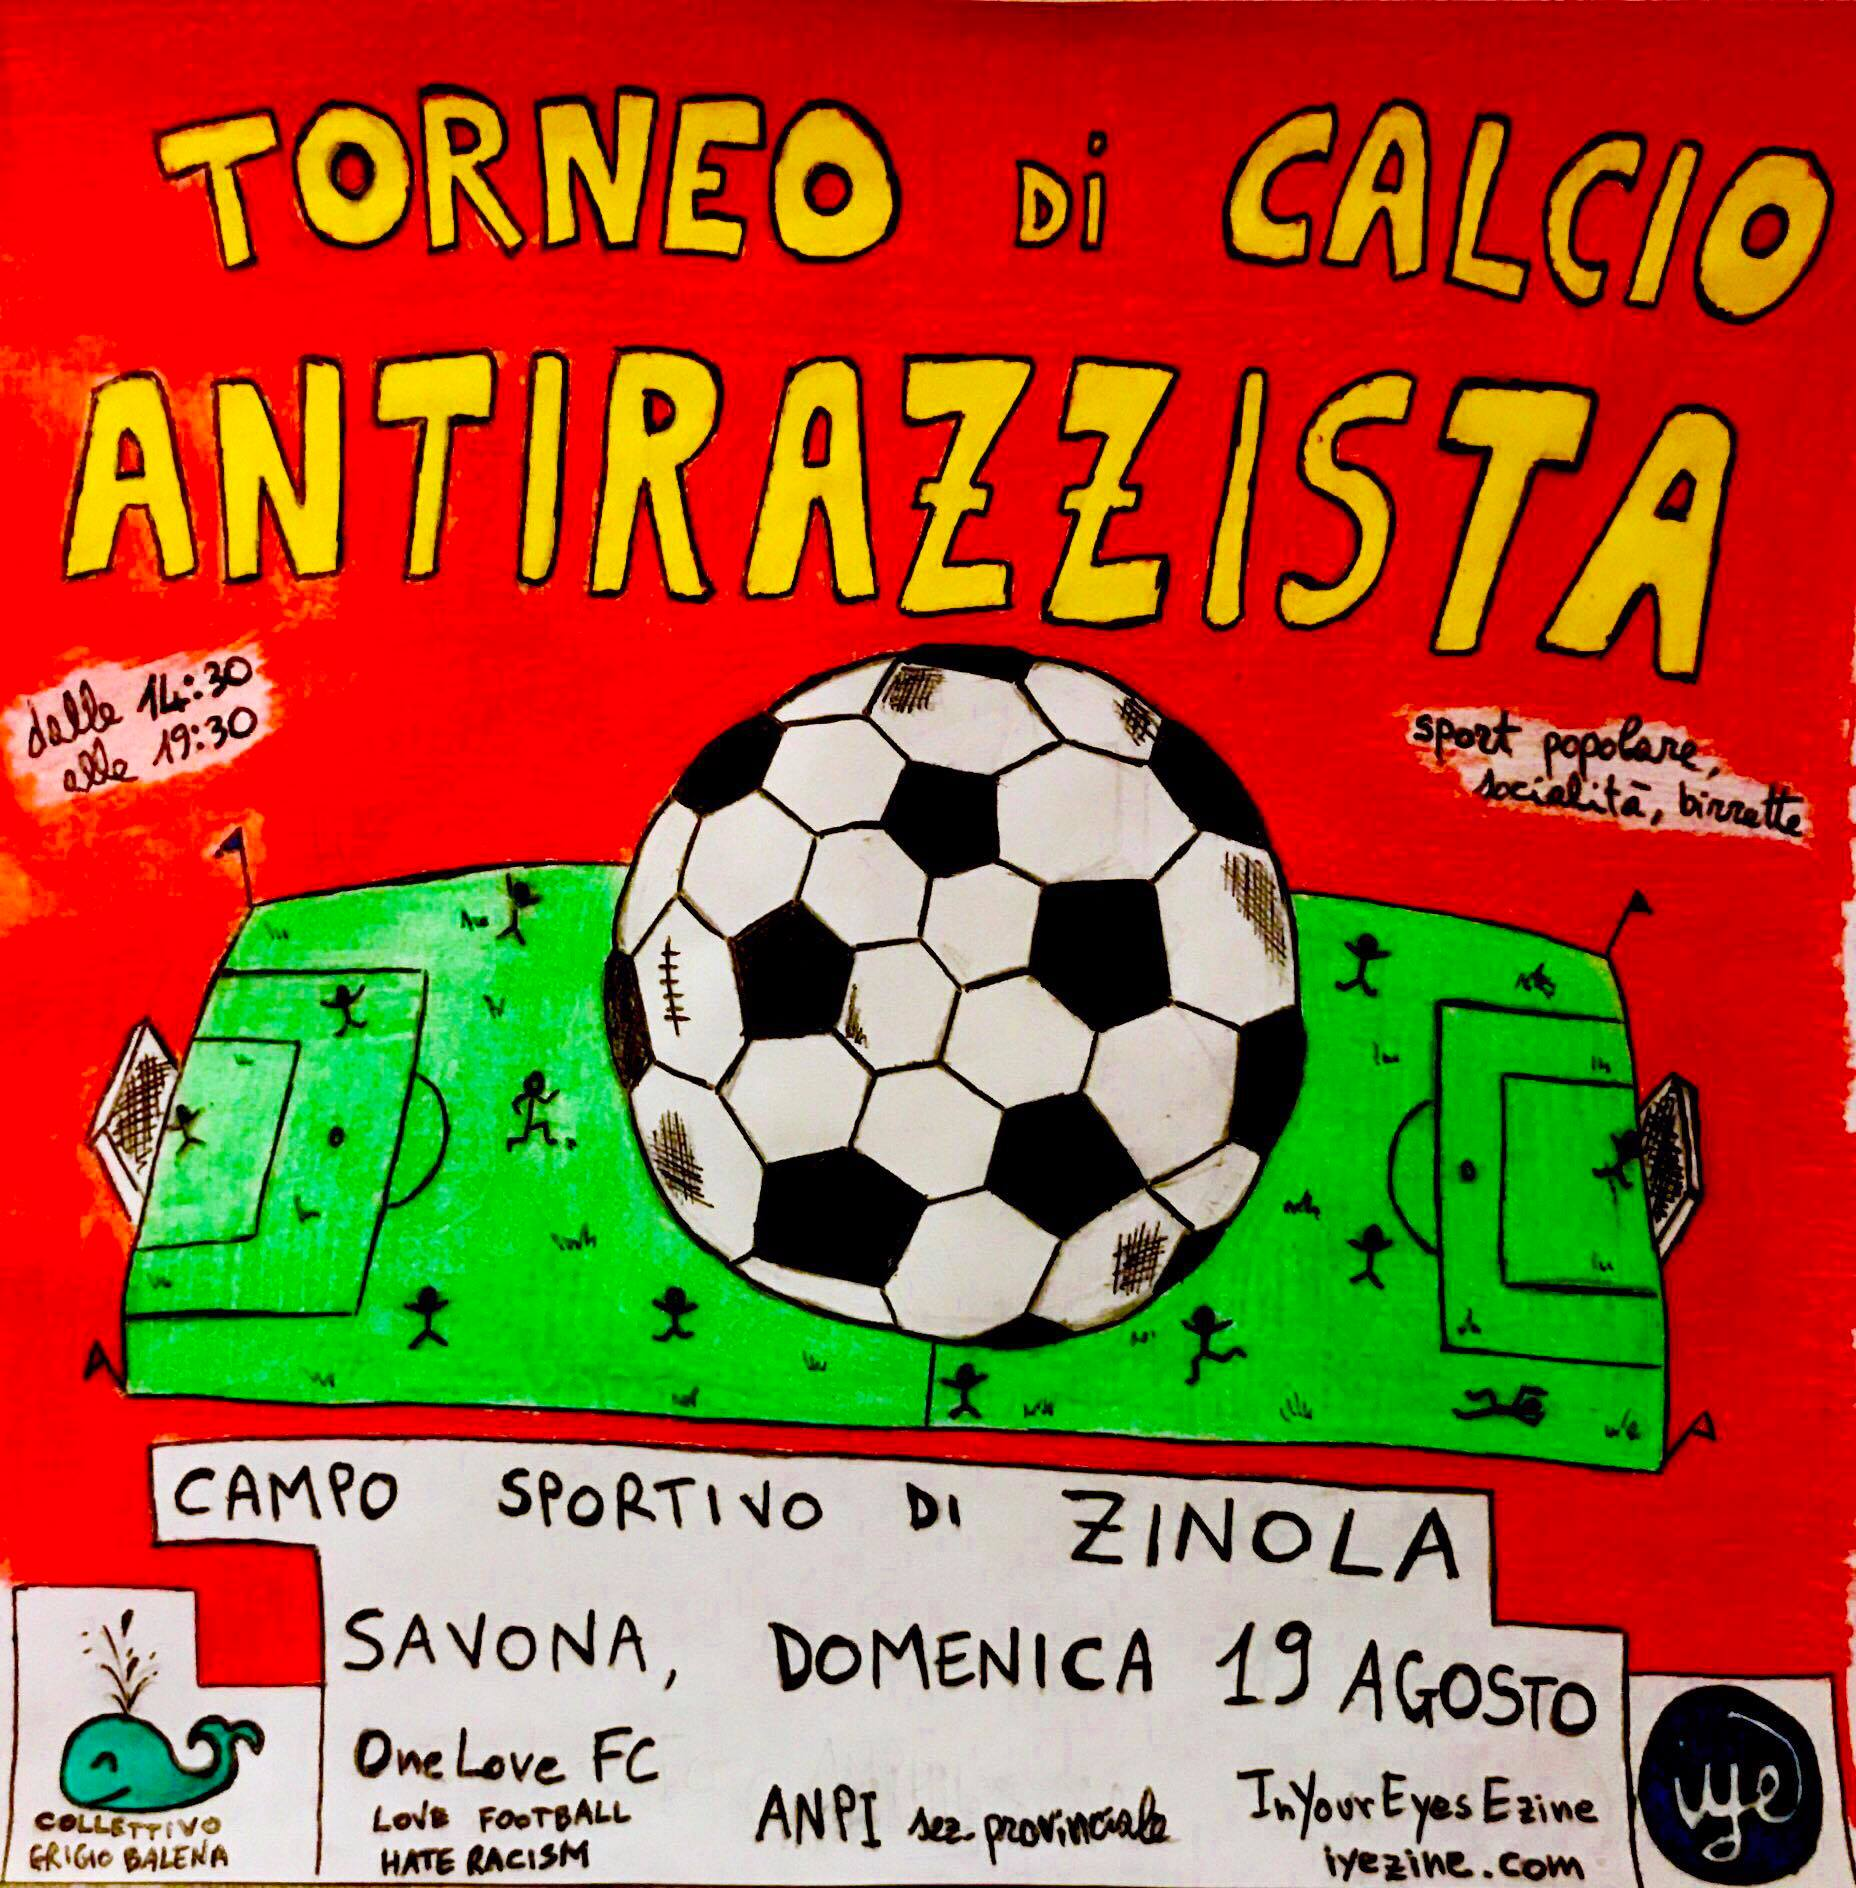 Torneo di Calcio Antirazzista a Savona 2018 1 - fanzine